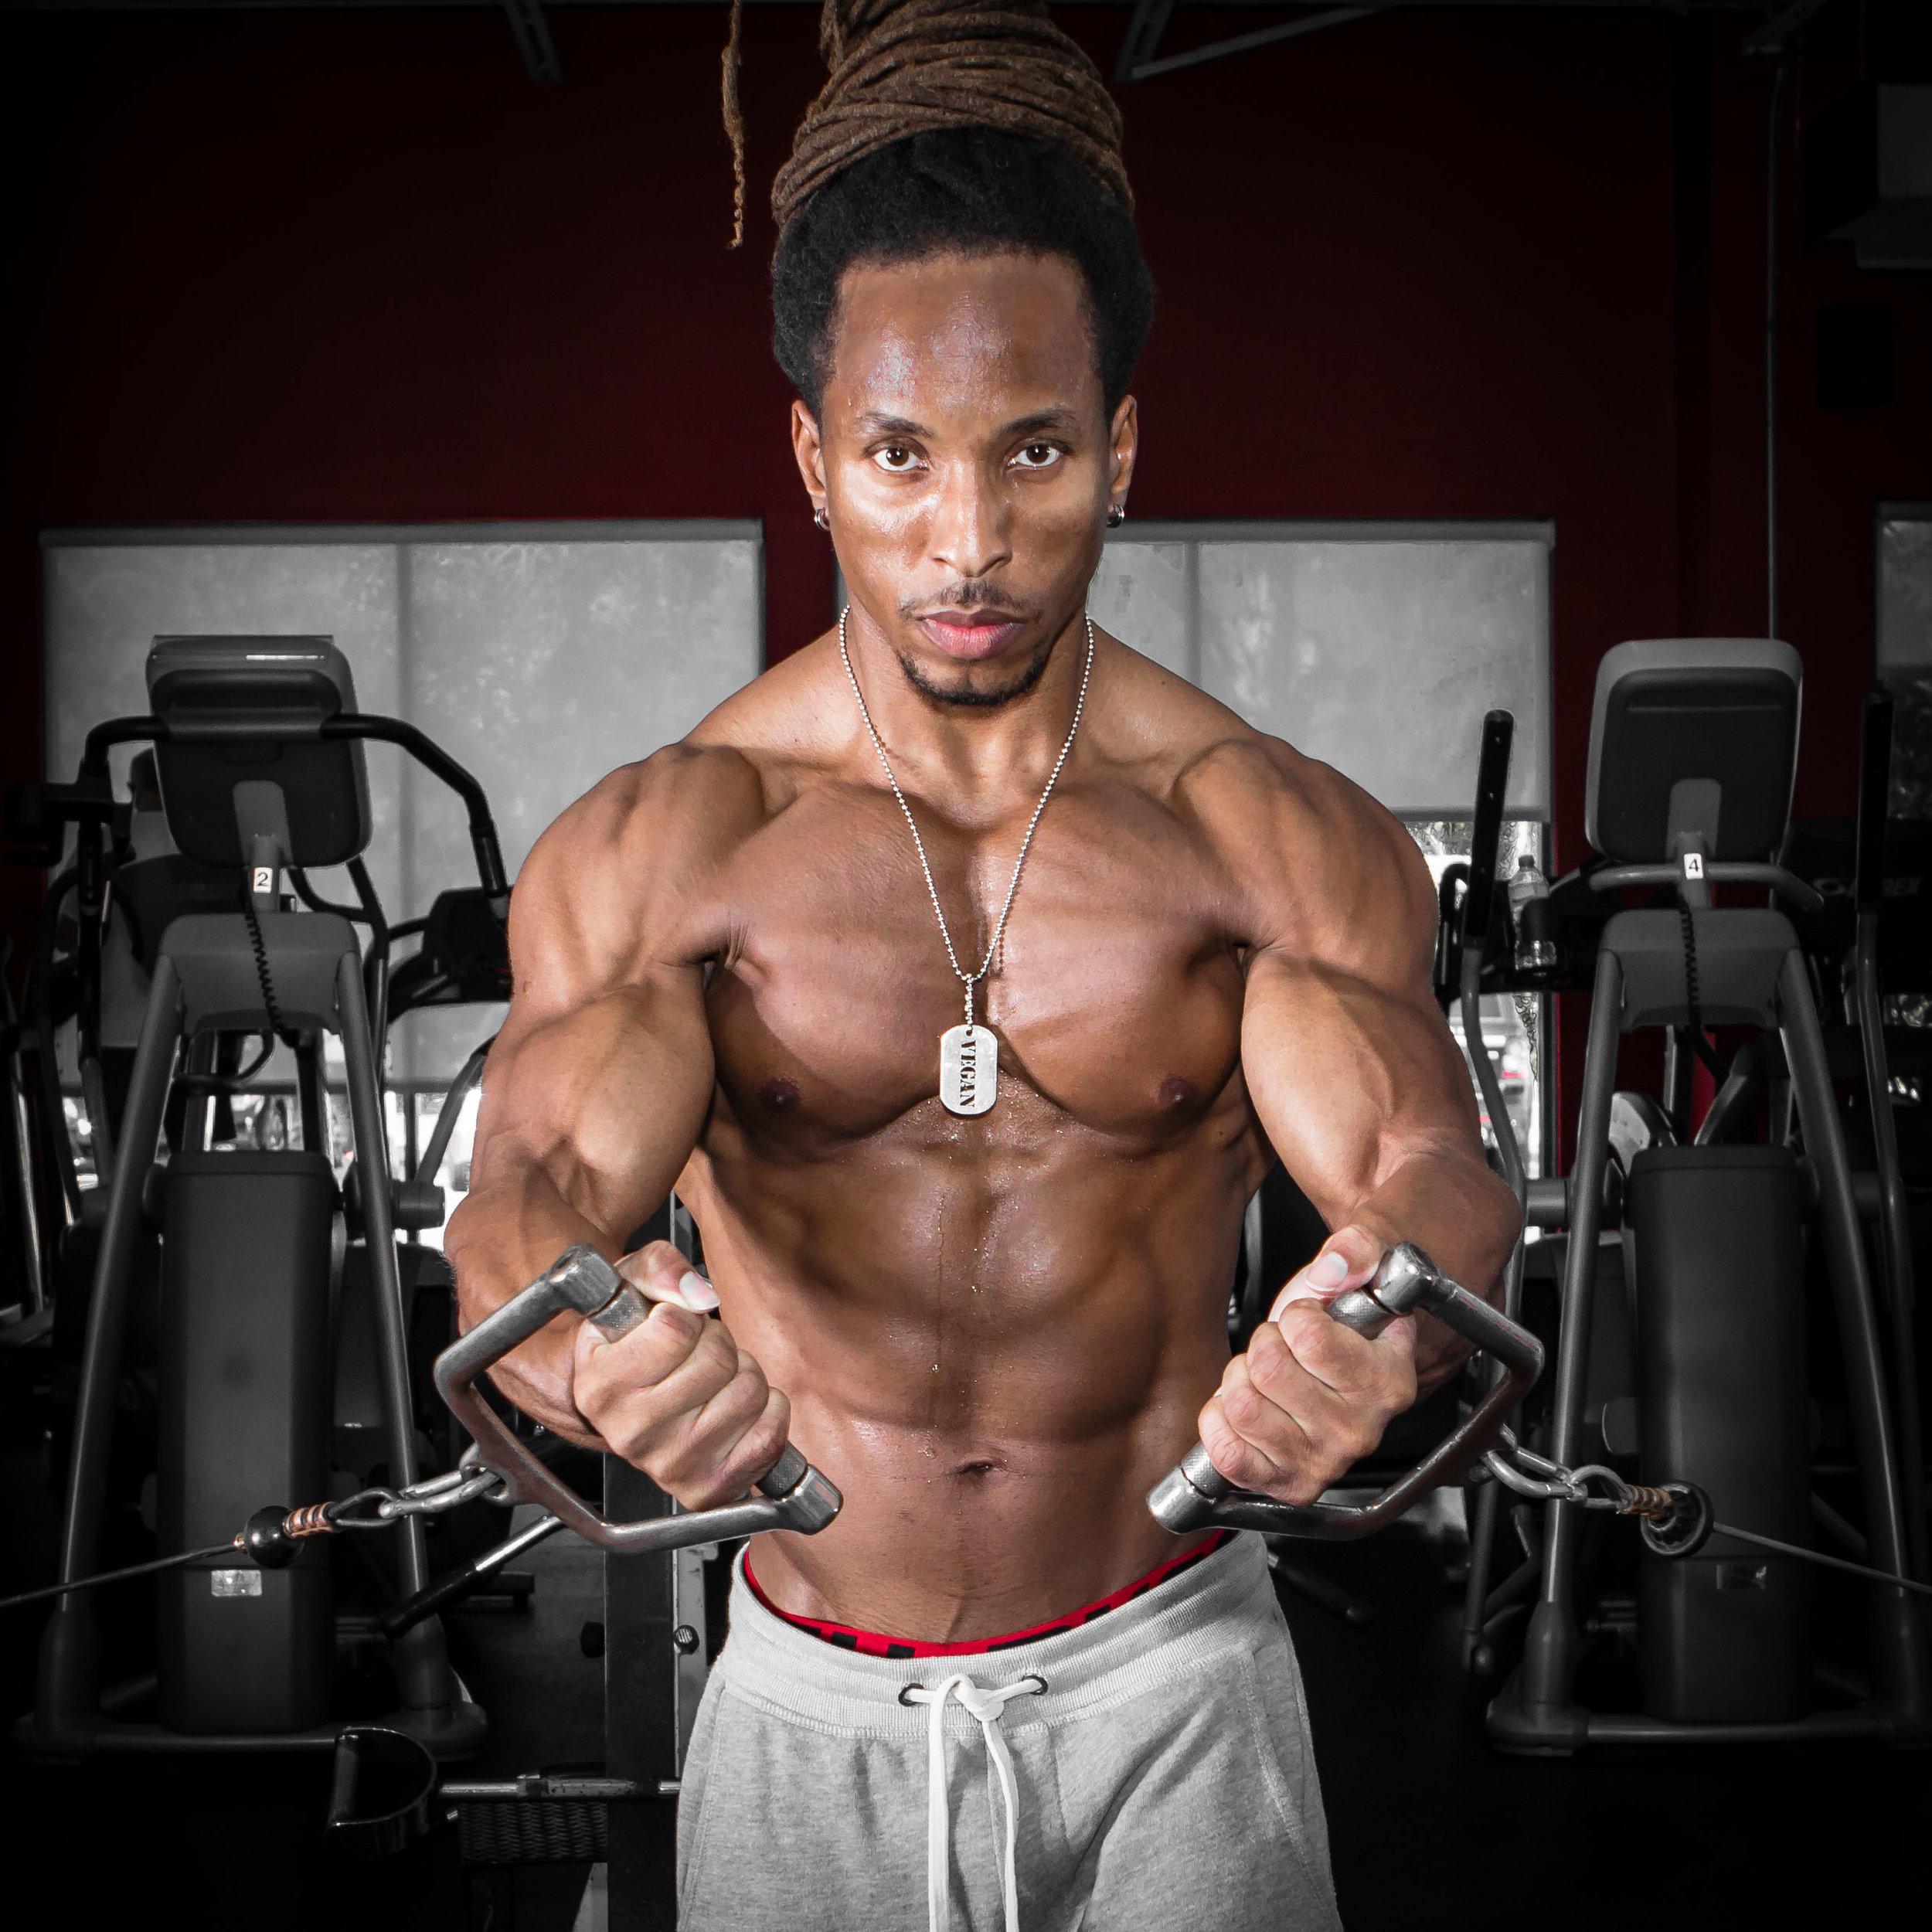 Torre Washington, Vegan and supplement free body builder since 1998